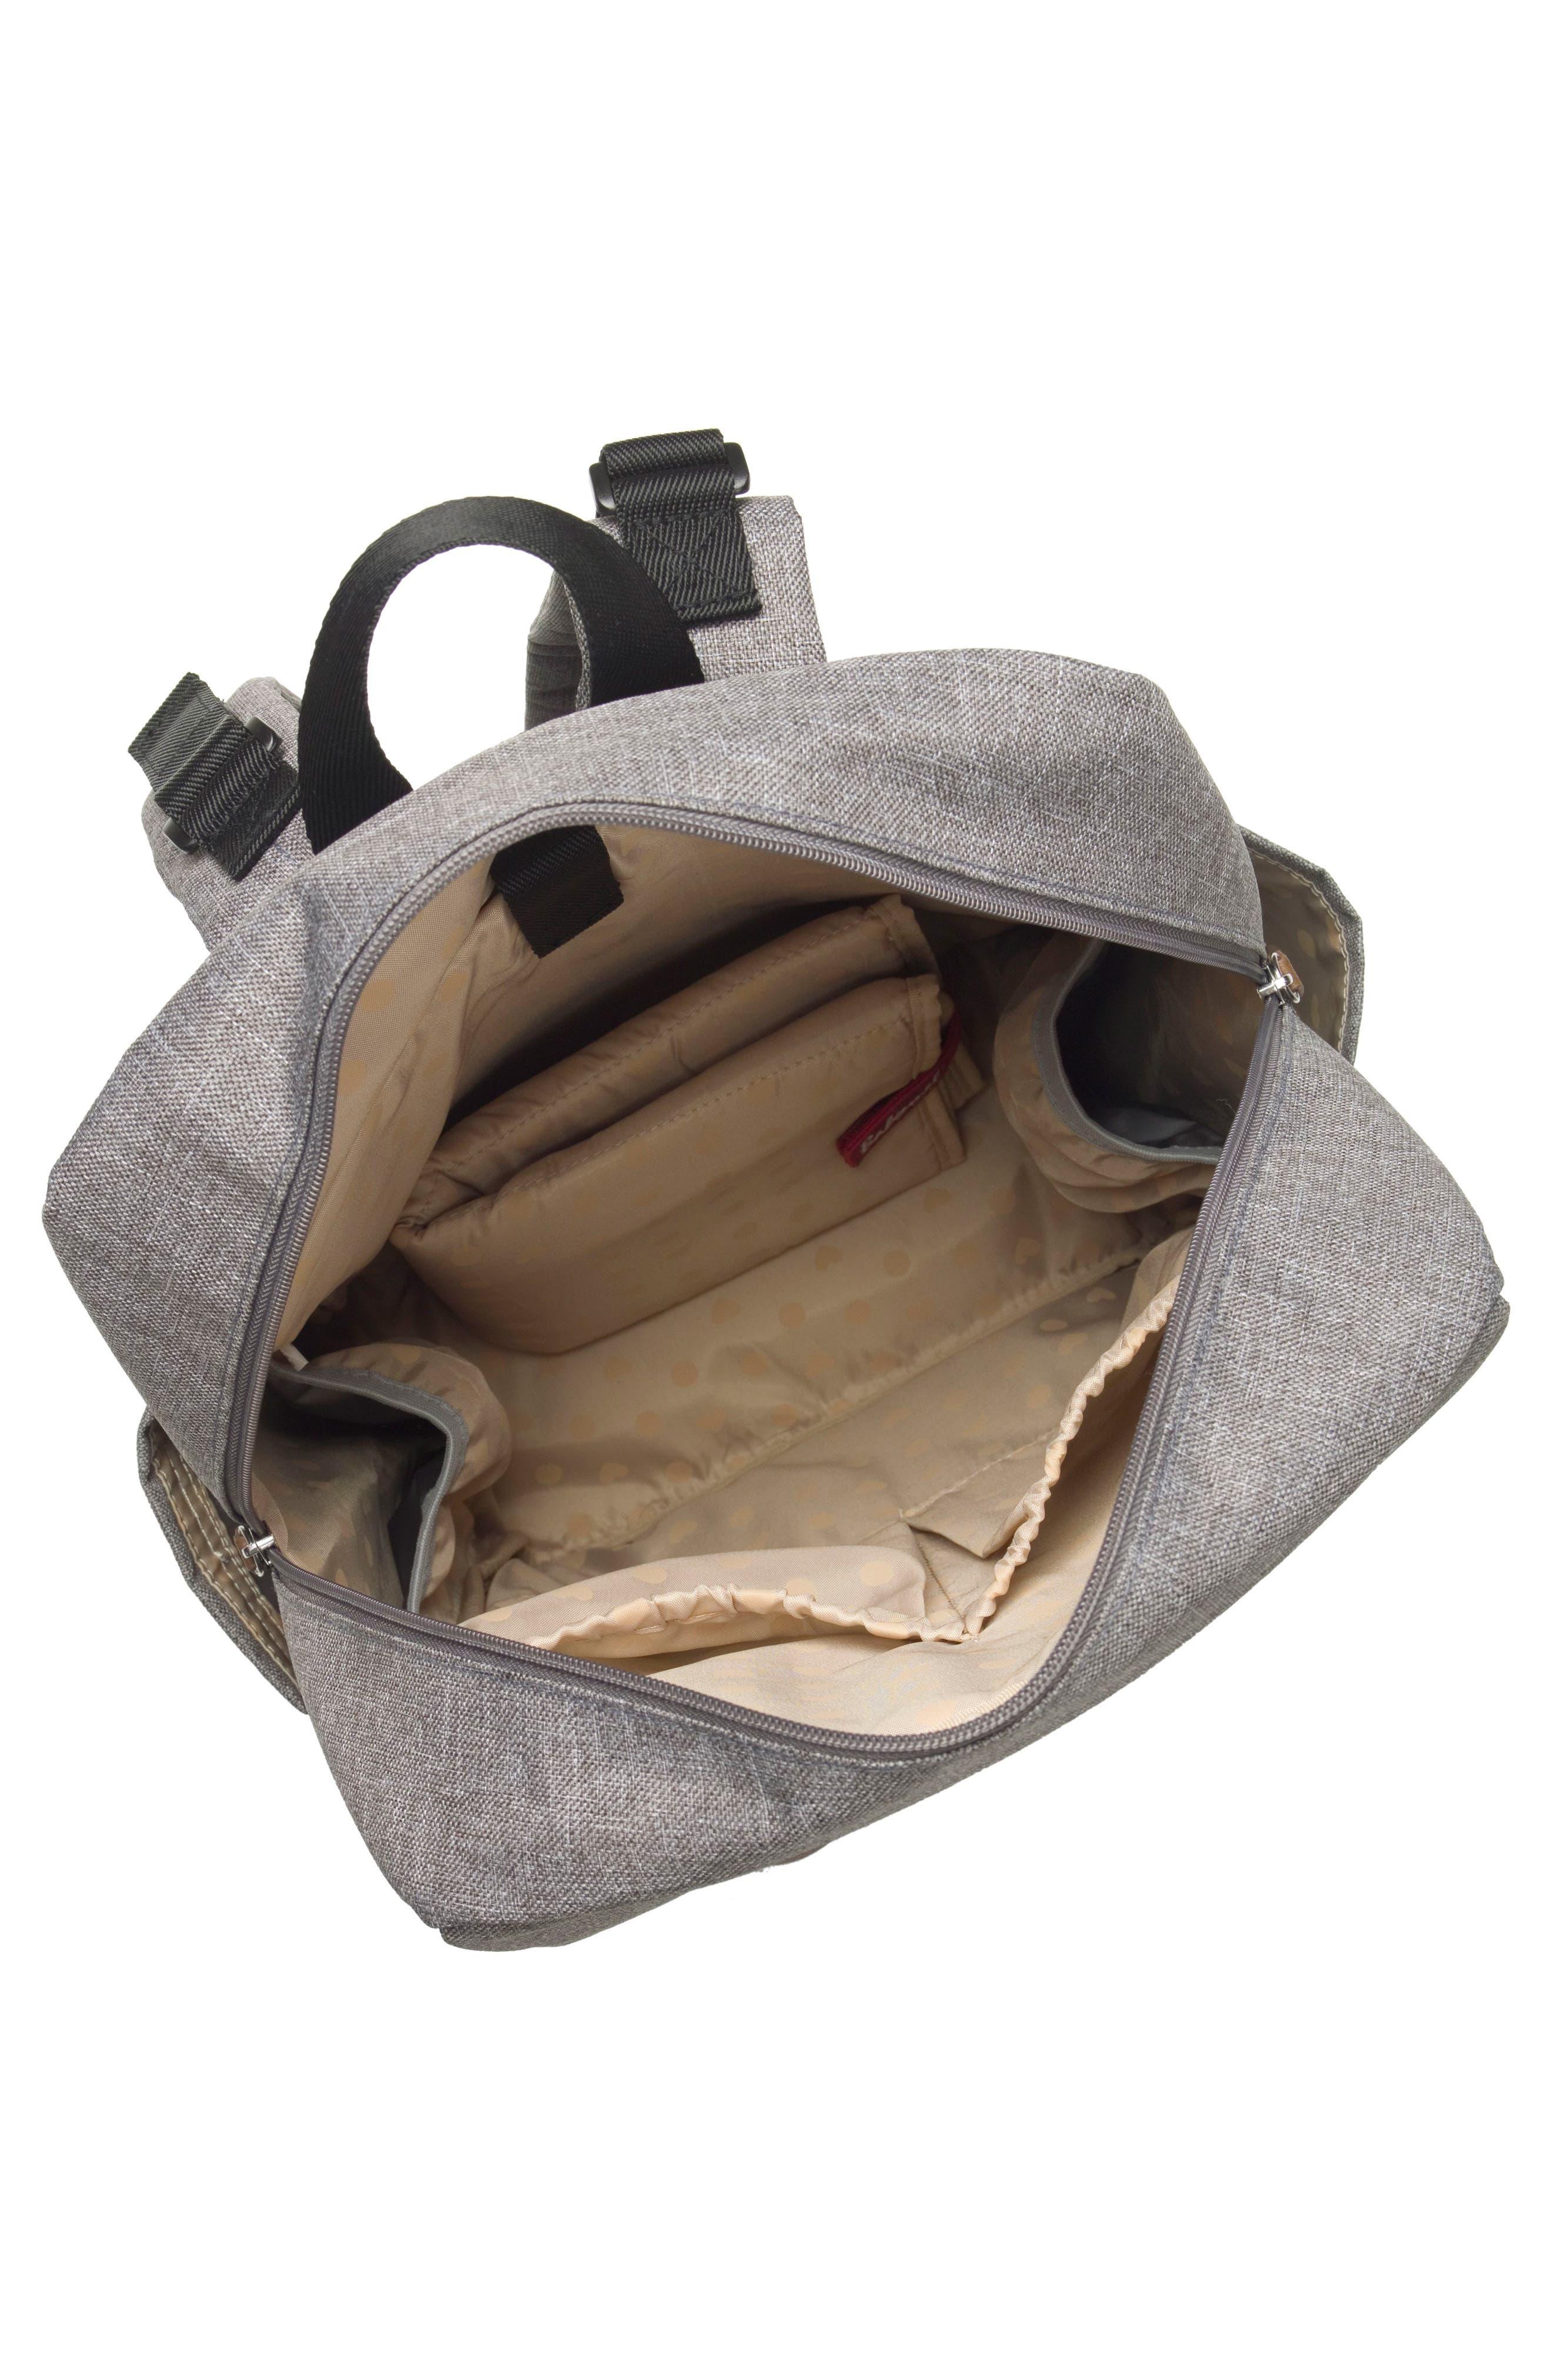 George Water Resistant Diaper Backpack,                             Alternate thumbnail 5, color,                             BLACK/ GREY